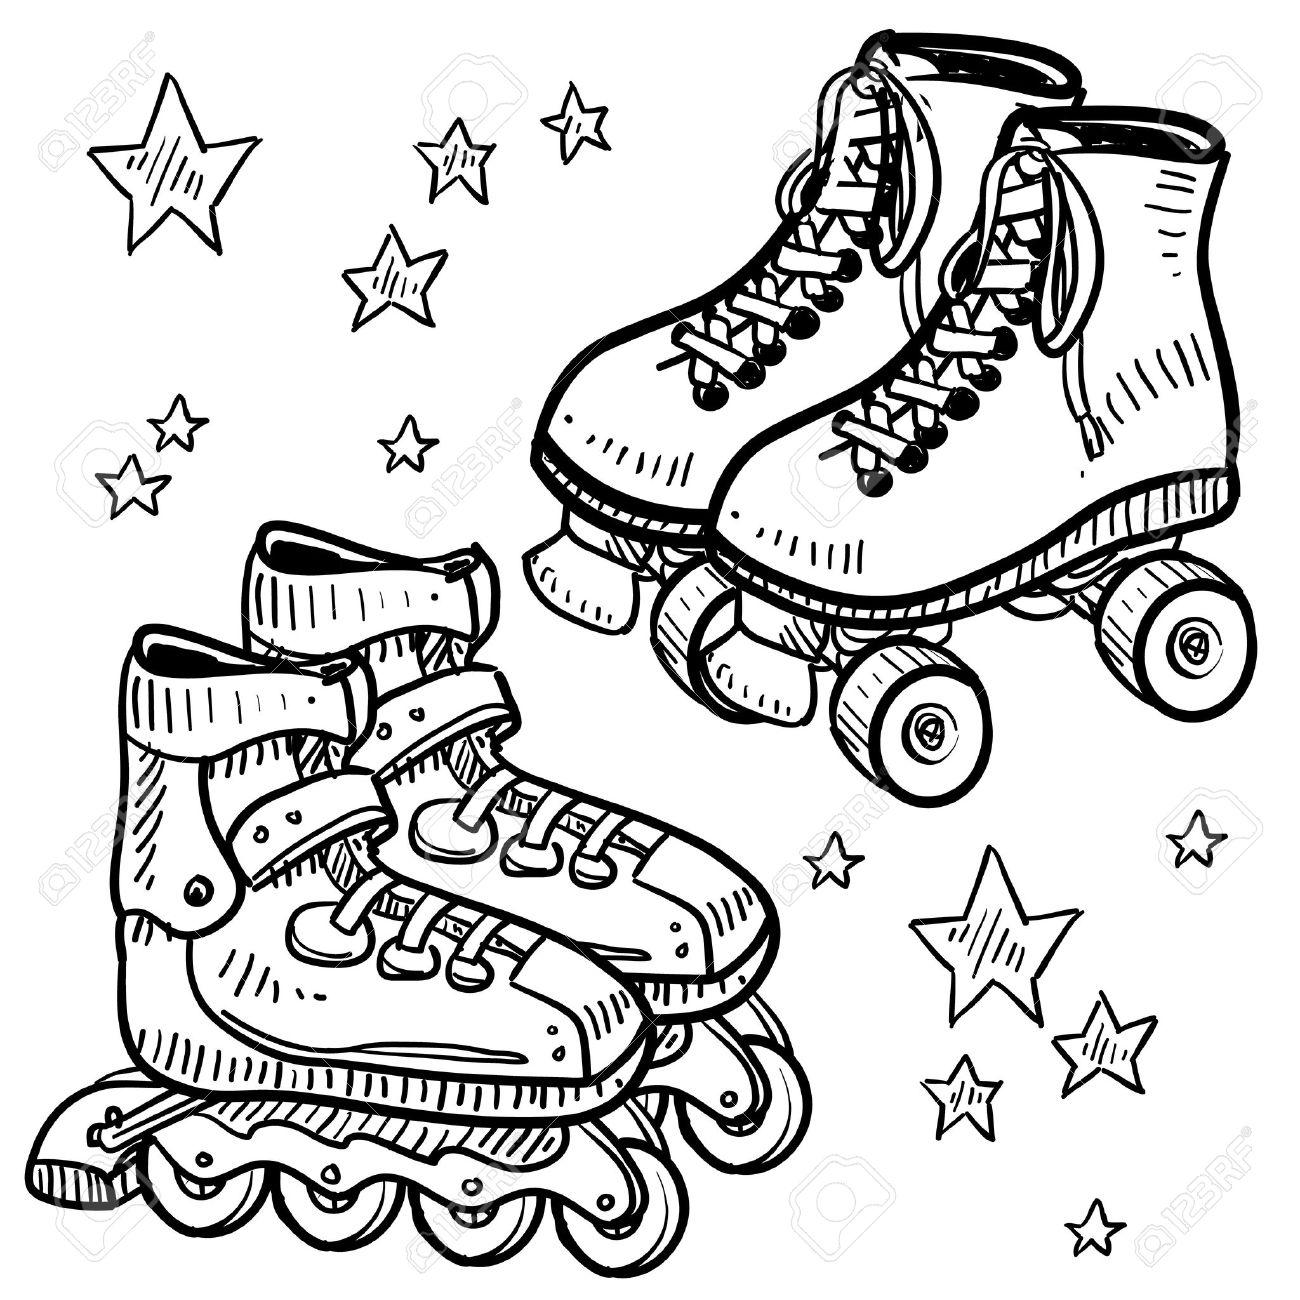 Roller skates book - Doodle Style Sketch Of Roller In Illustration Stock Vector 14590500